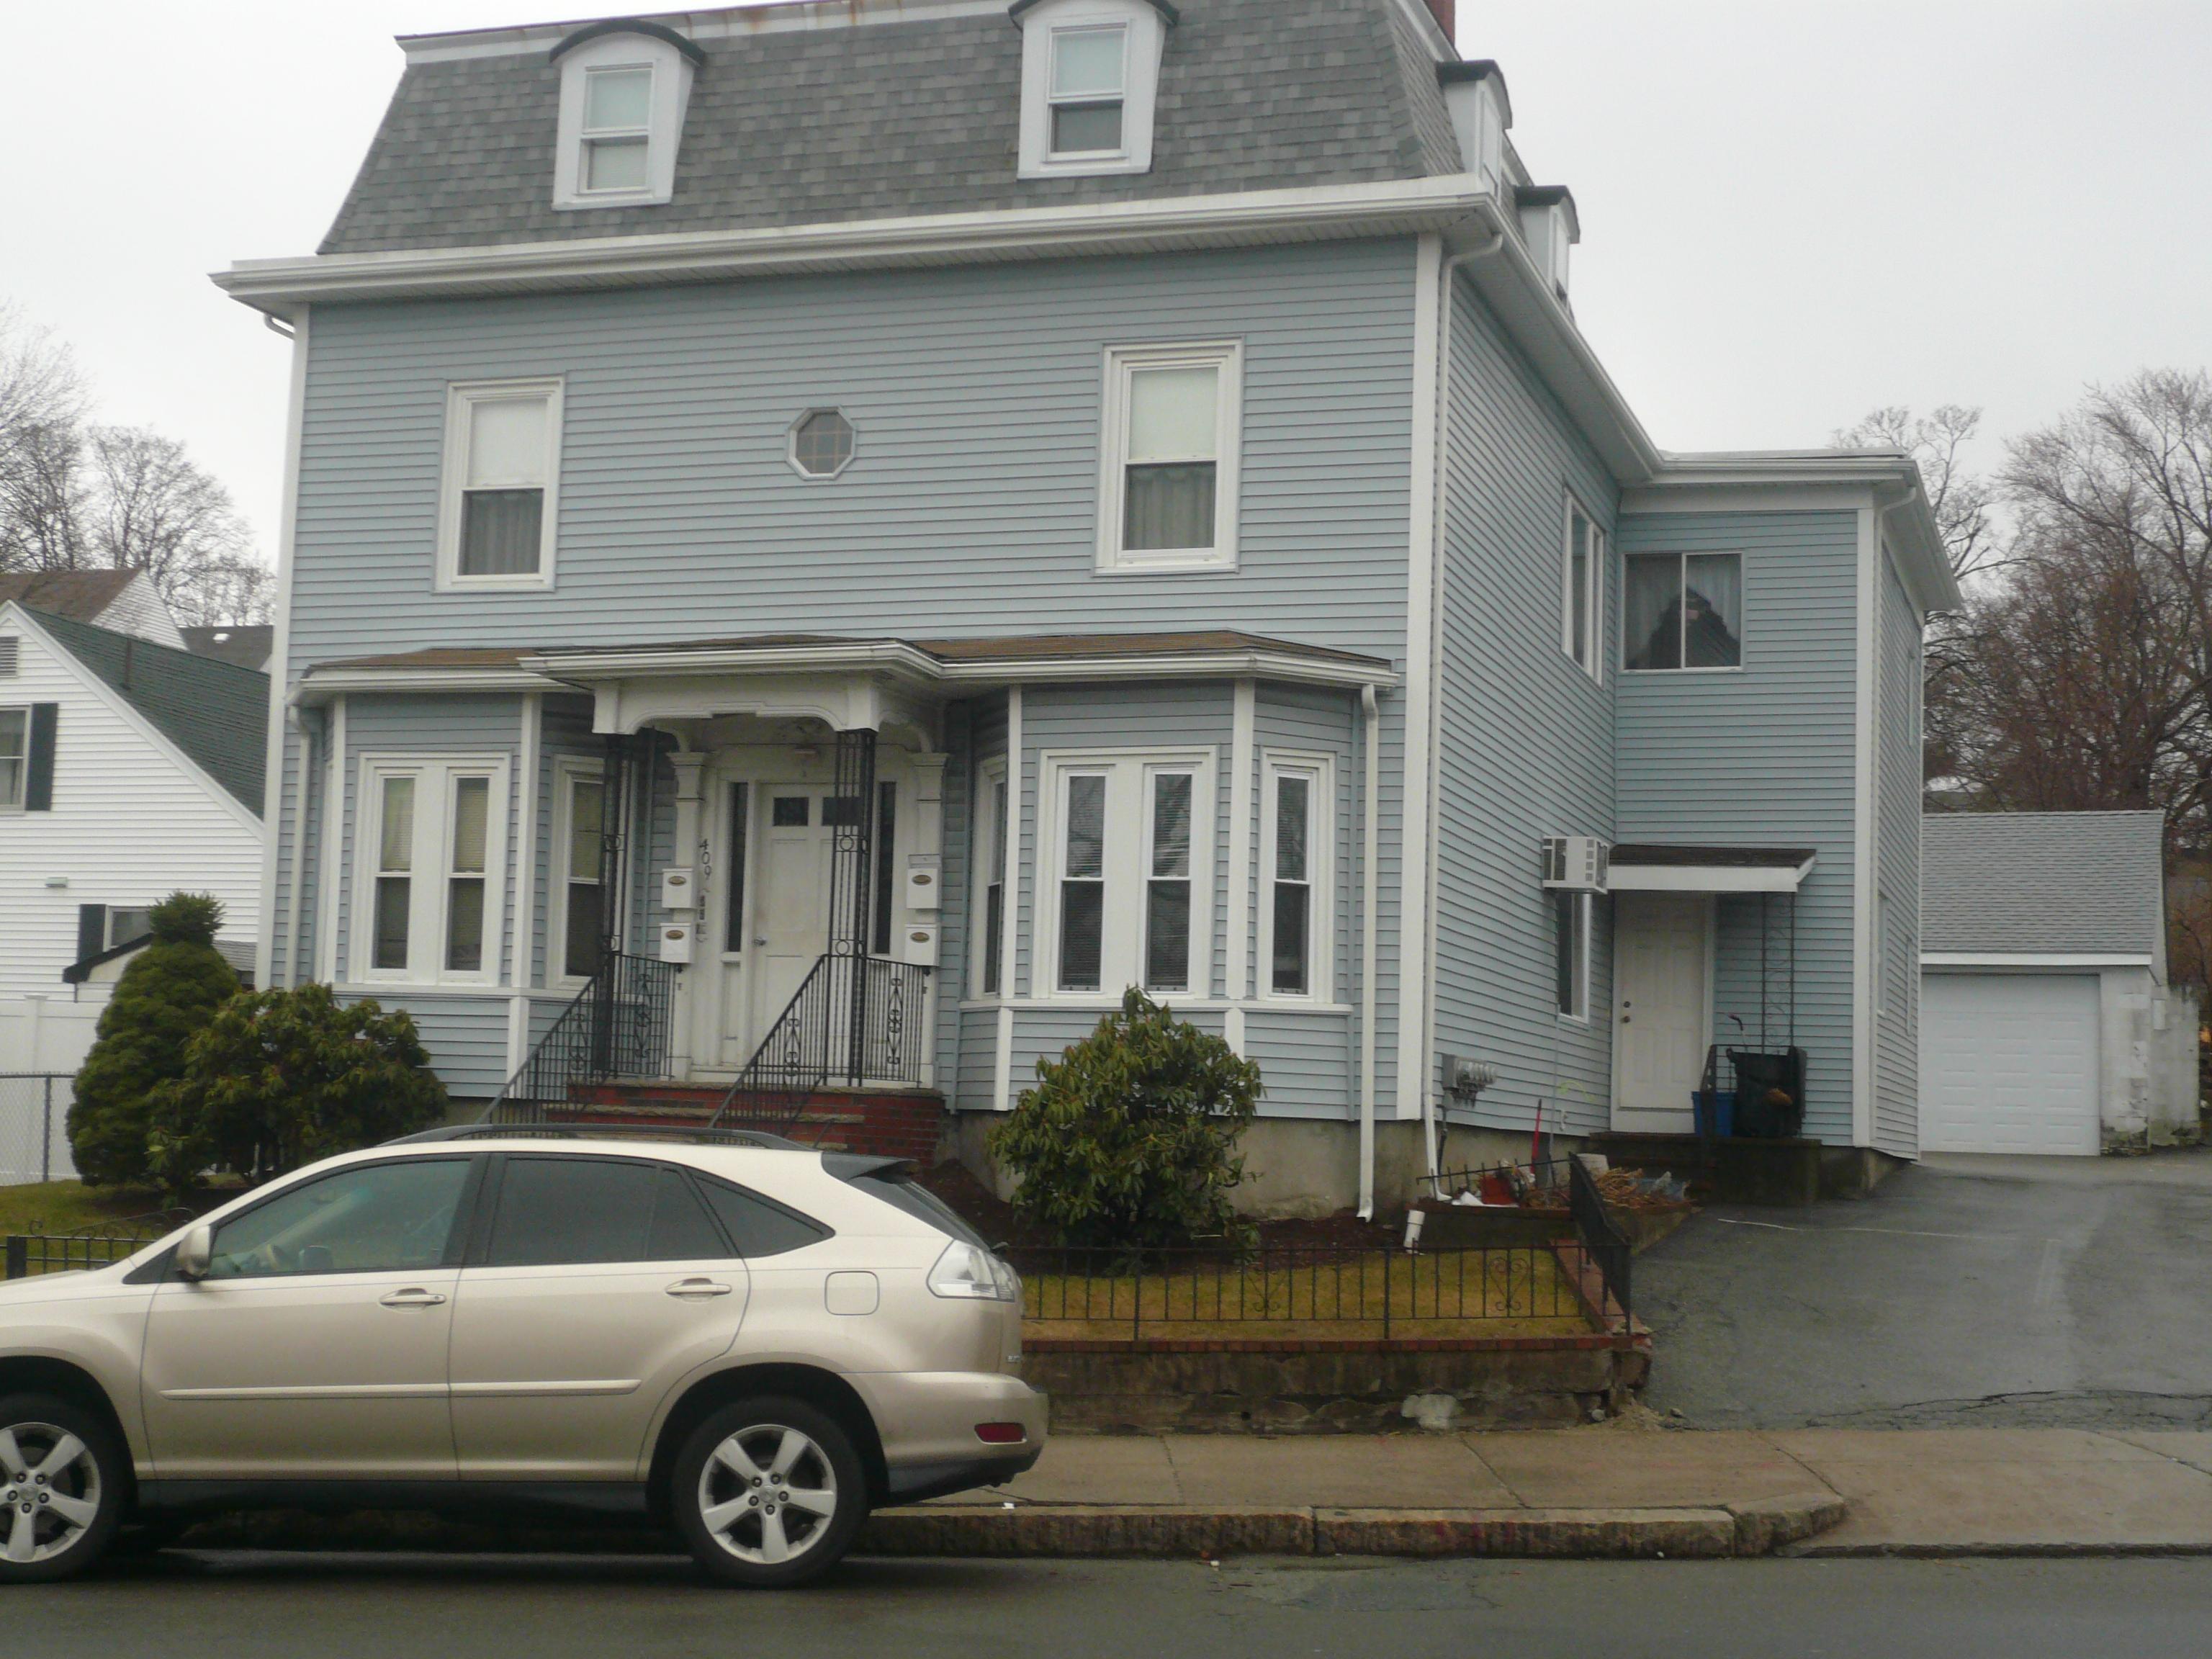 409 Ferry Street, Malden, Massachusetts 02148